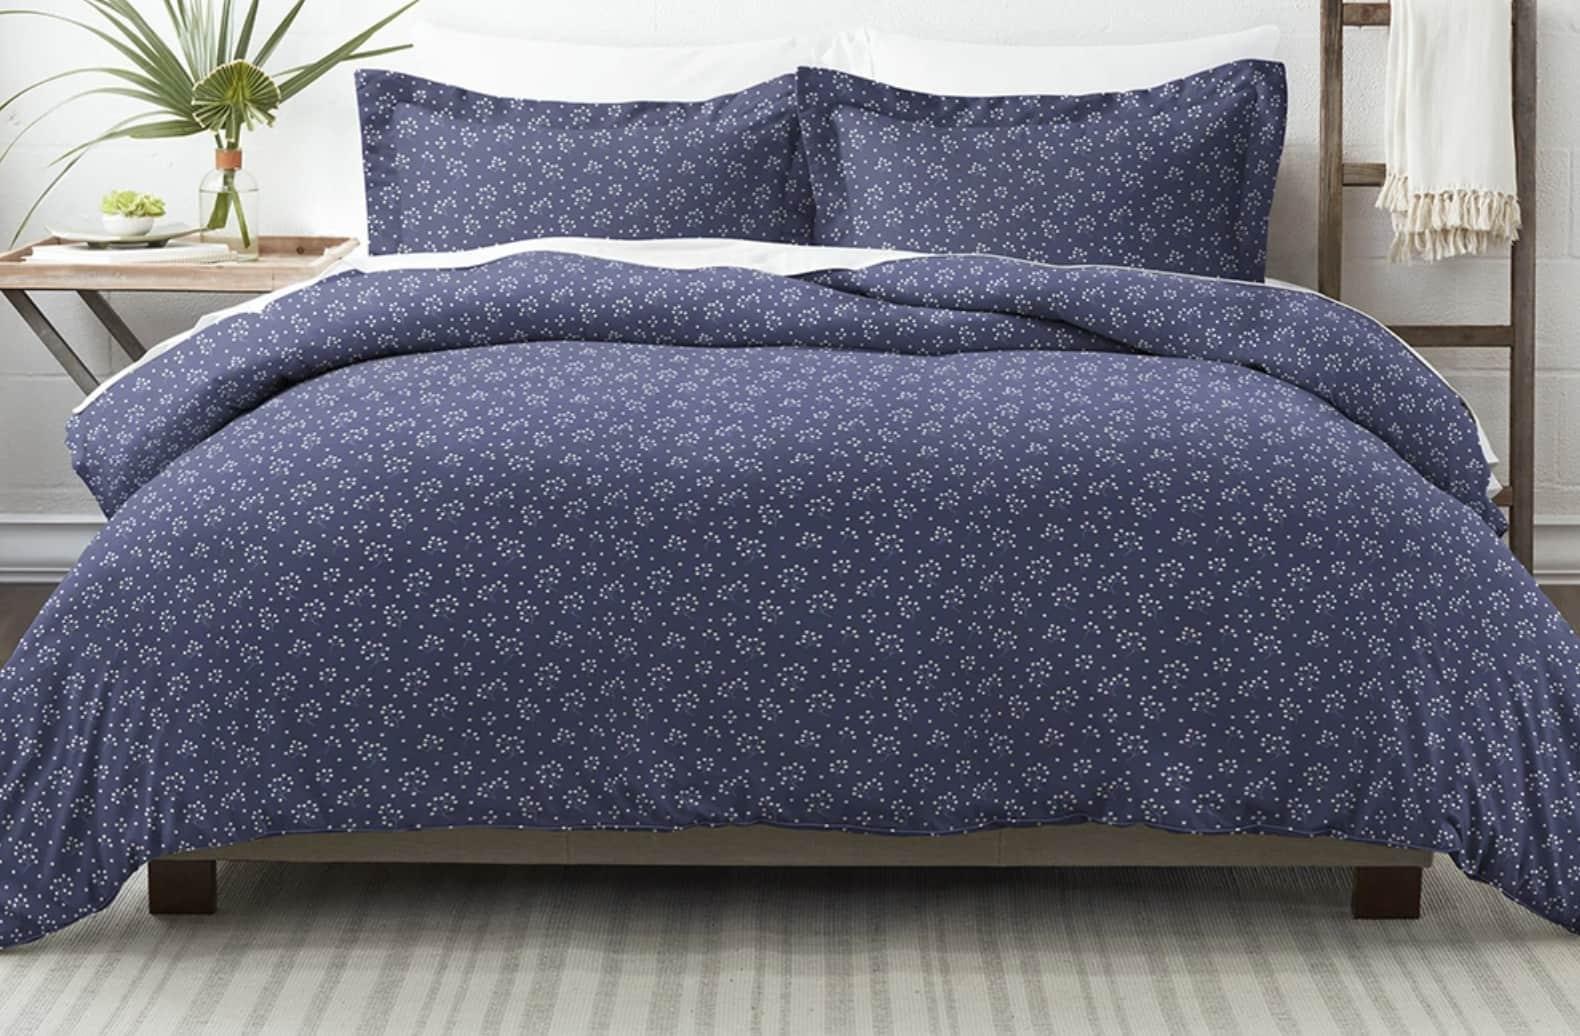 Linen's & Hutch Patterned Duvet Cover Sets